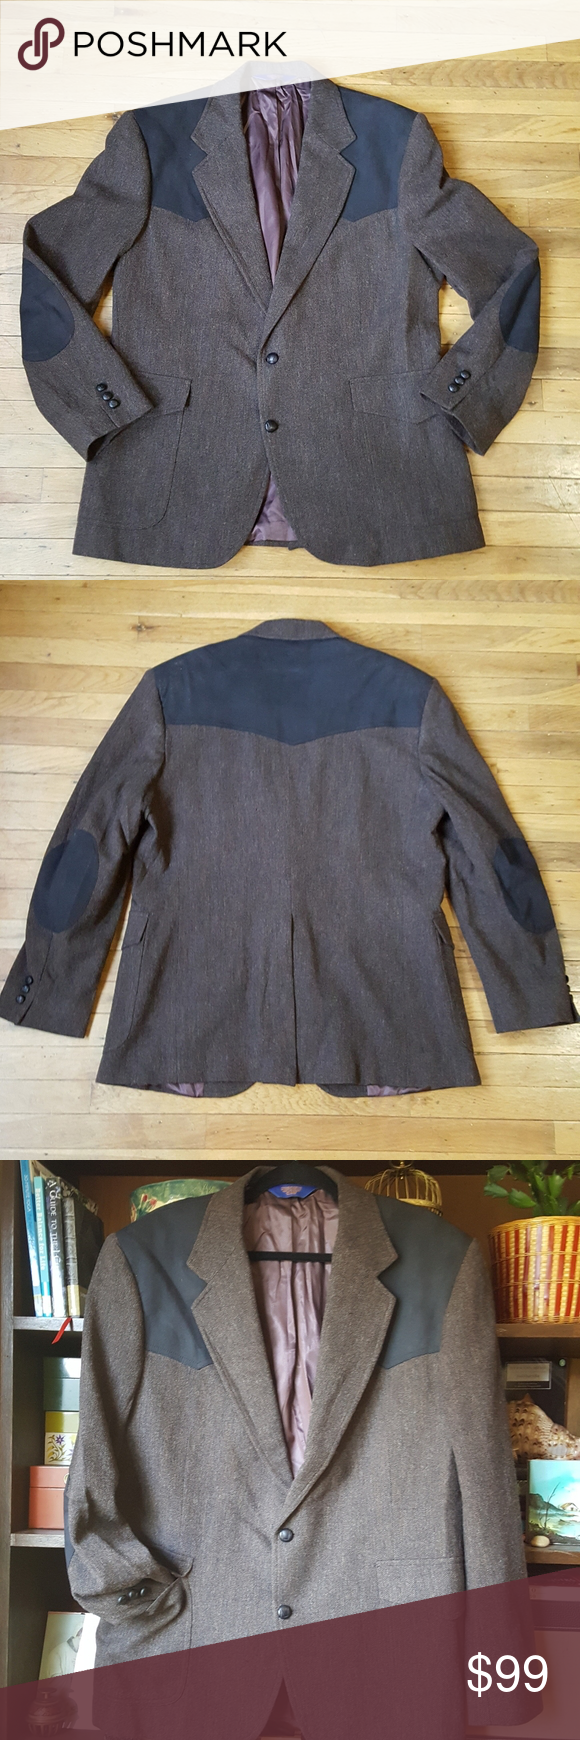 Pendleton wool western blazer elbow patch jacket Elbow